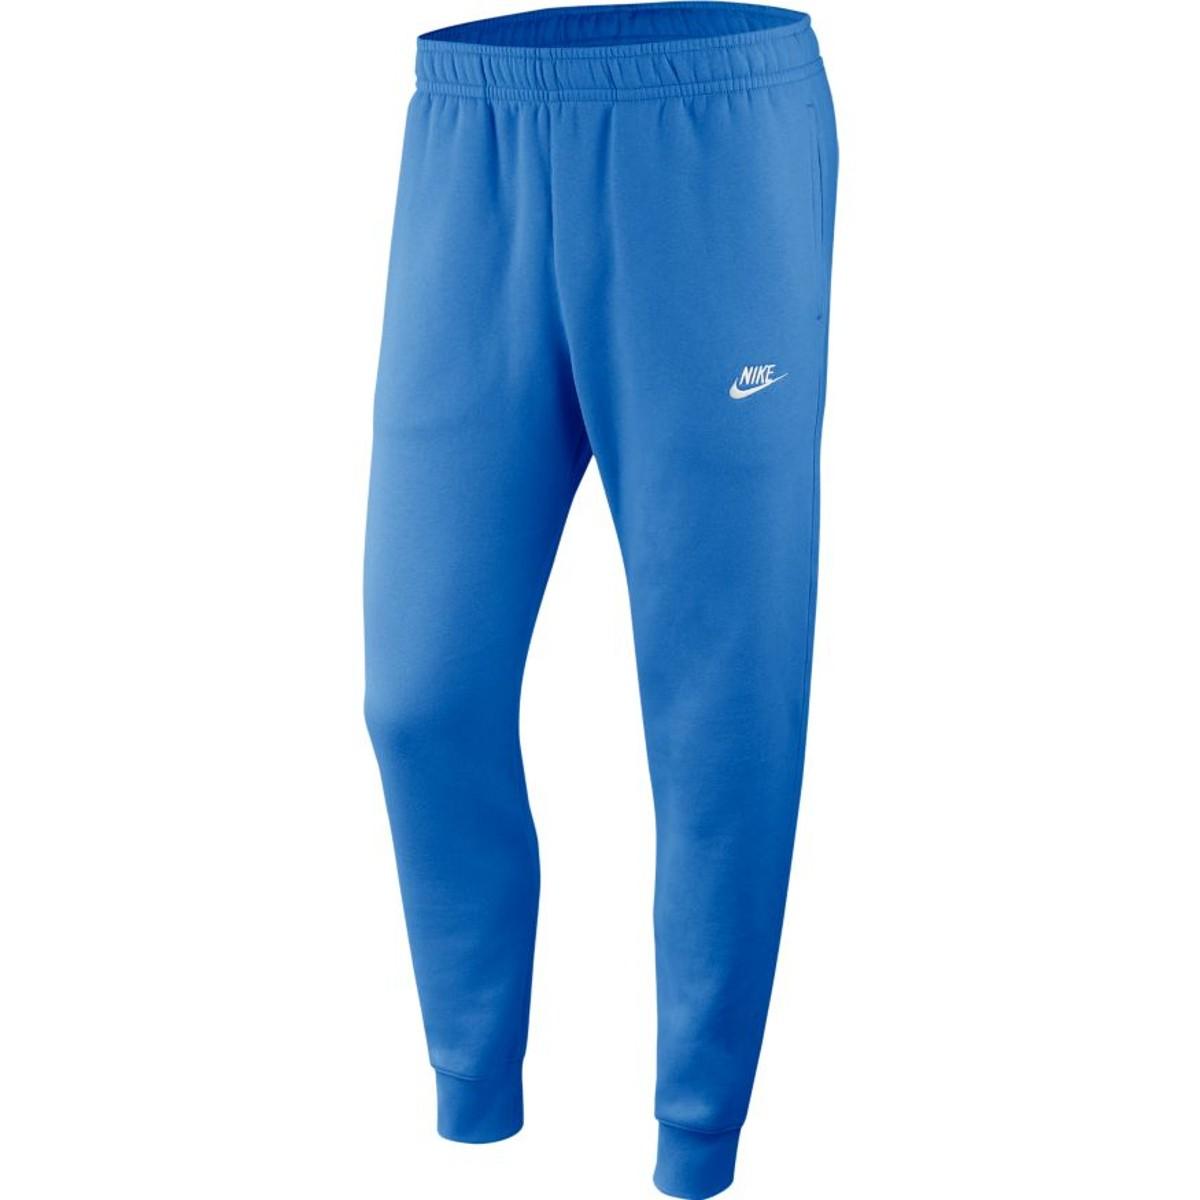 nike sportswear homme pantalon